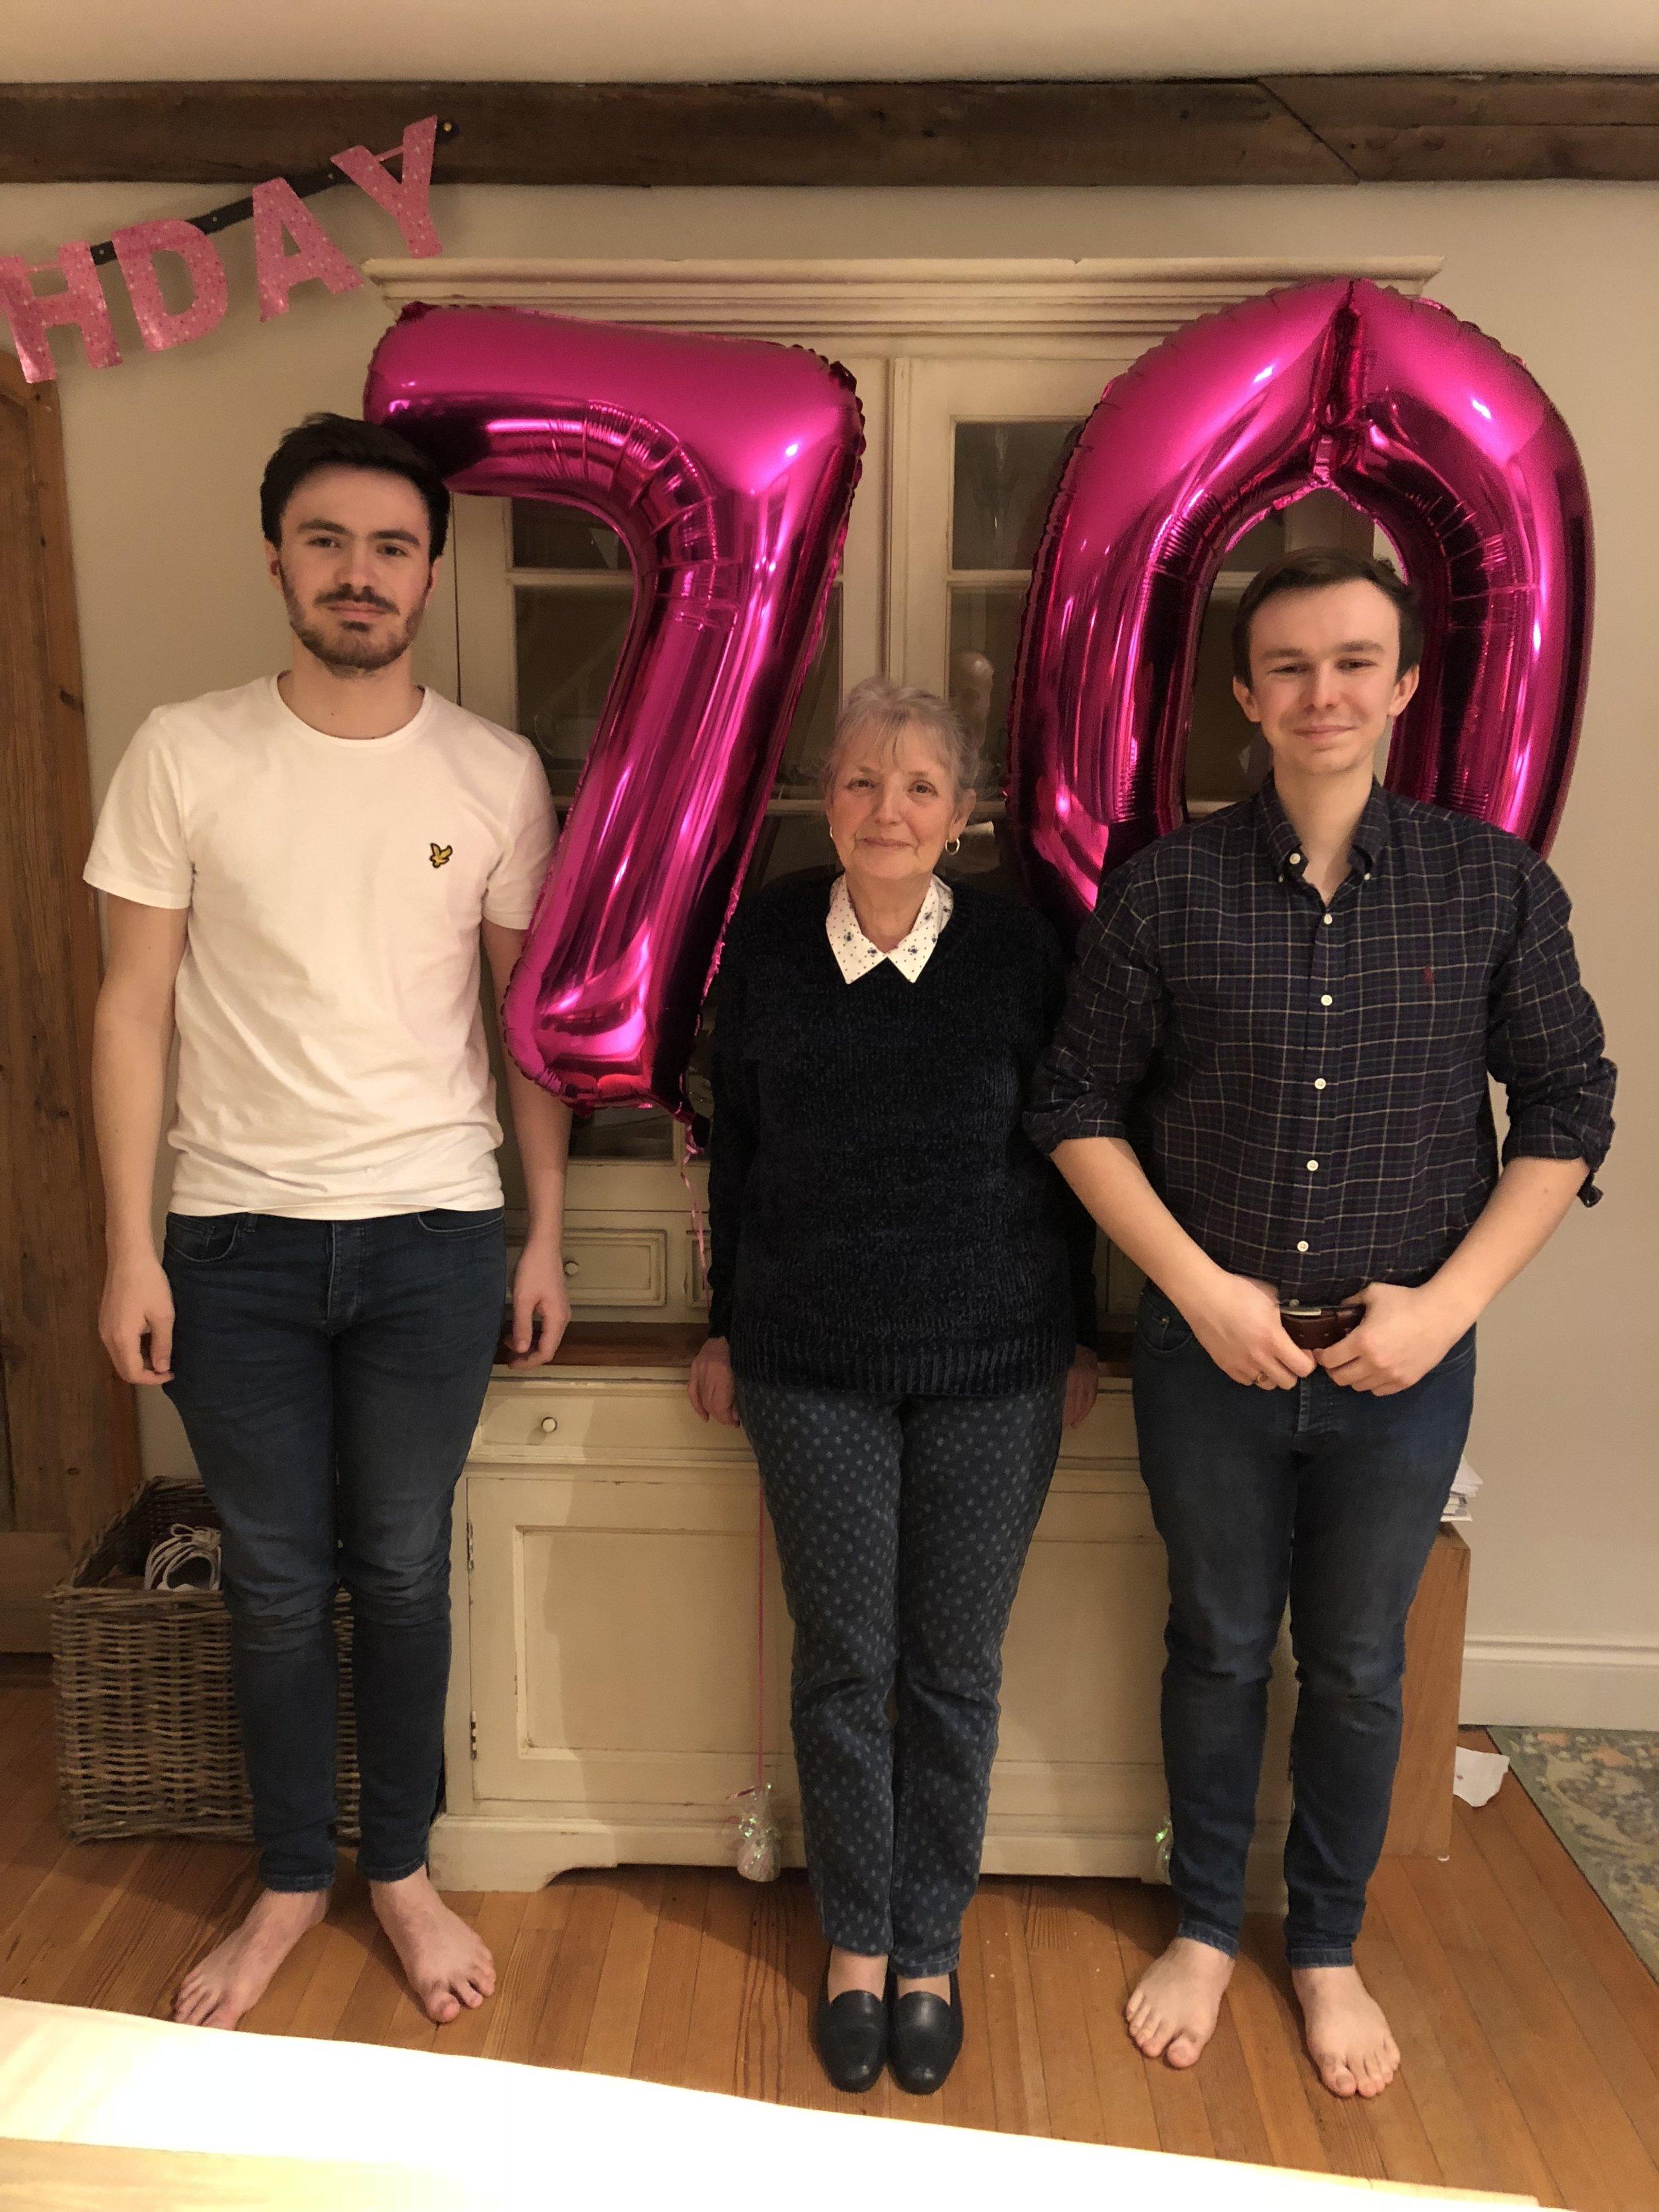 Wishing my mum the happiest of happy birthdays for next month...